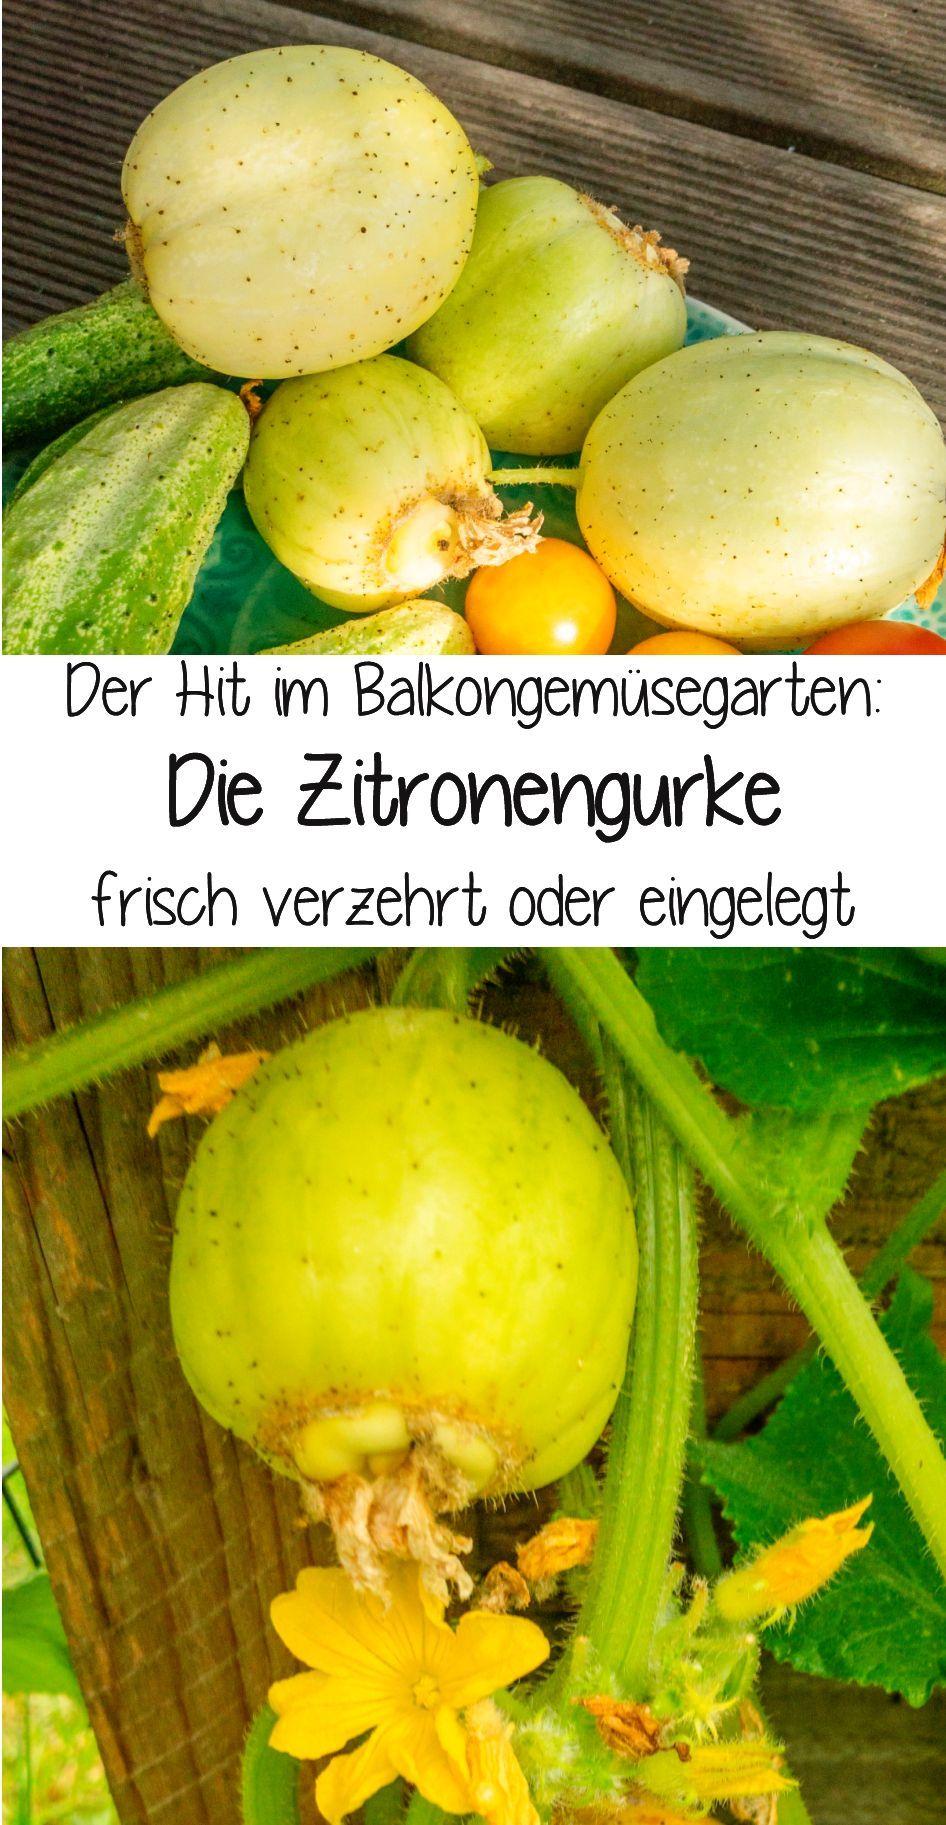 Mehltau Gurke Zitronengurke Balkon Gemuse Garten In Baden Baden Rezept Gurke Gesundes Essen Kochen Zitrone